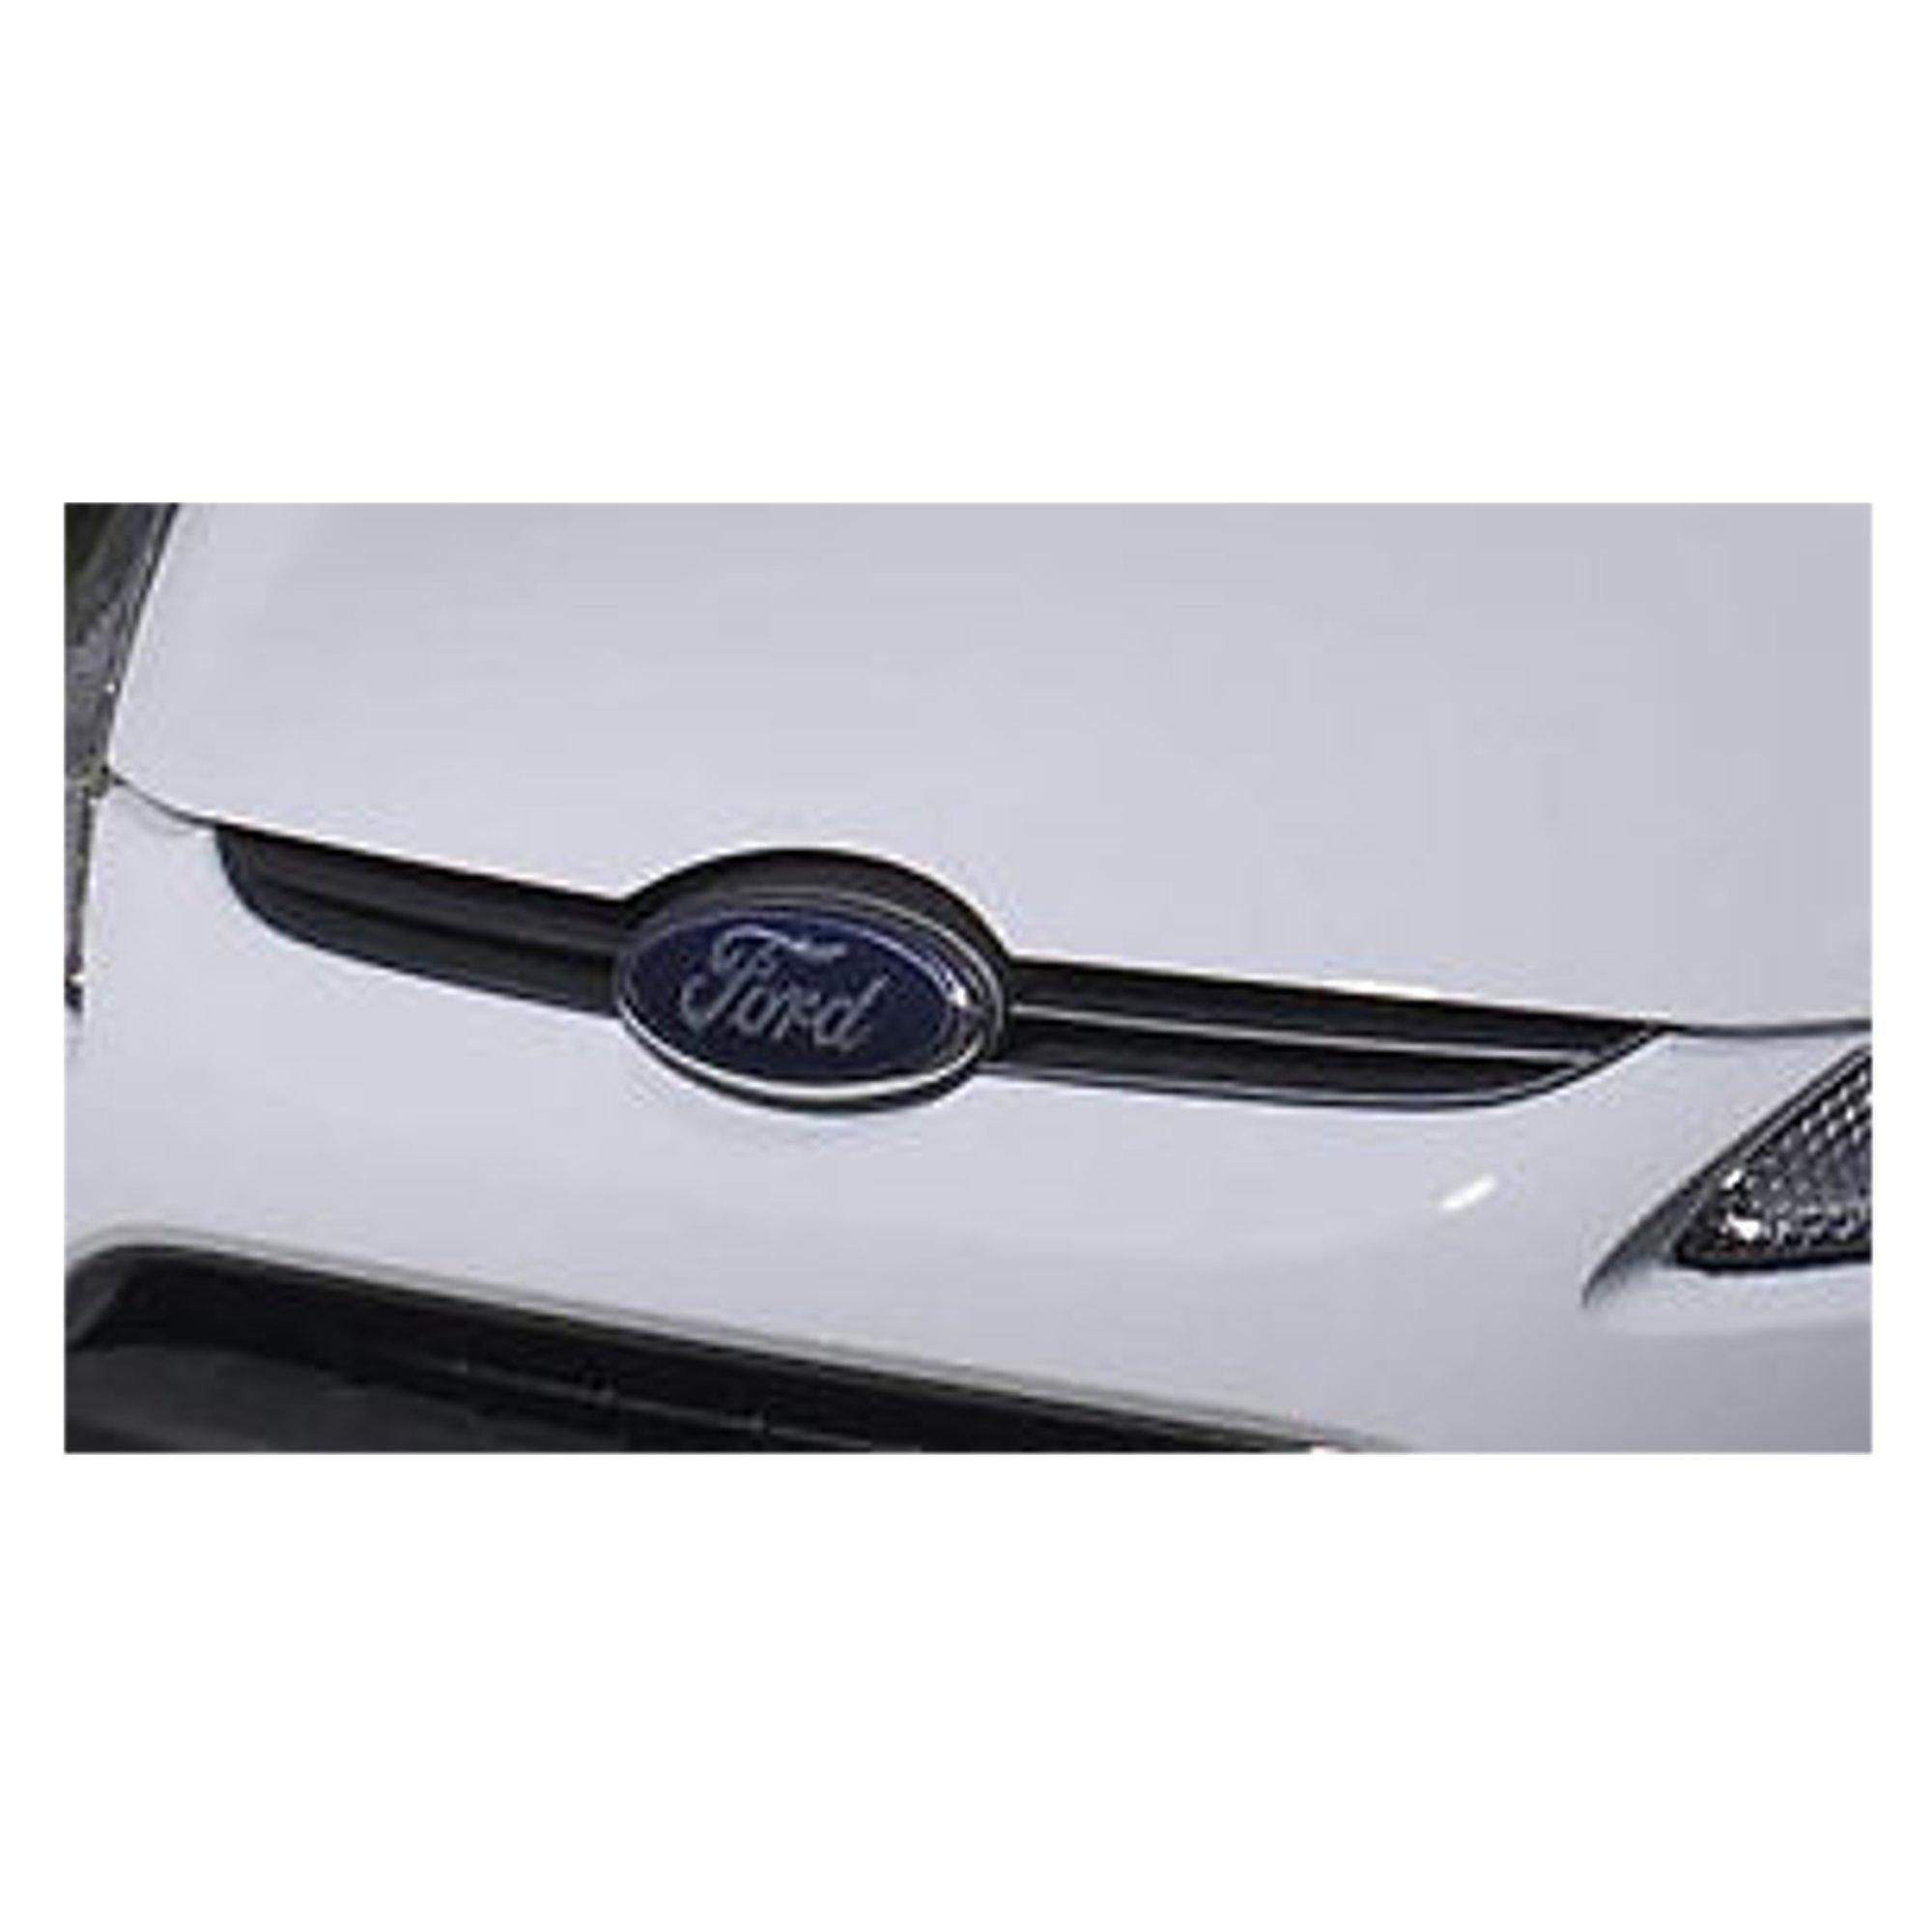 REFURBISHHOUSE For Ford Fiesta Mk7 2008-2012 Electric Wing Mirror Primed Left Passenger Side N//S